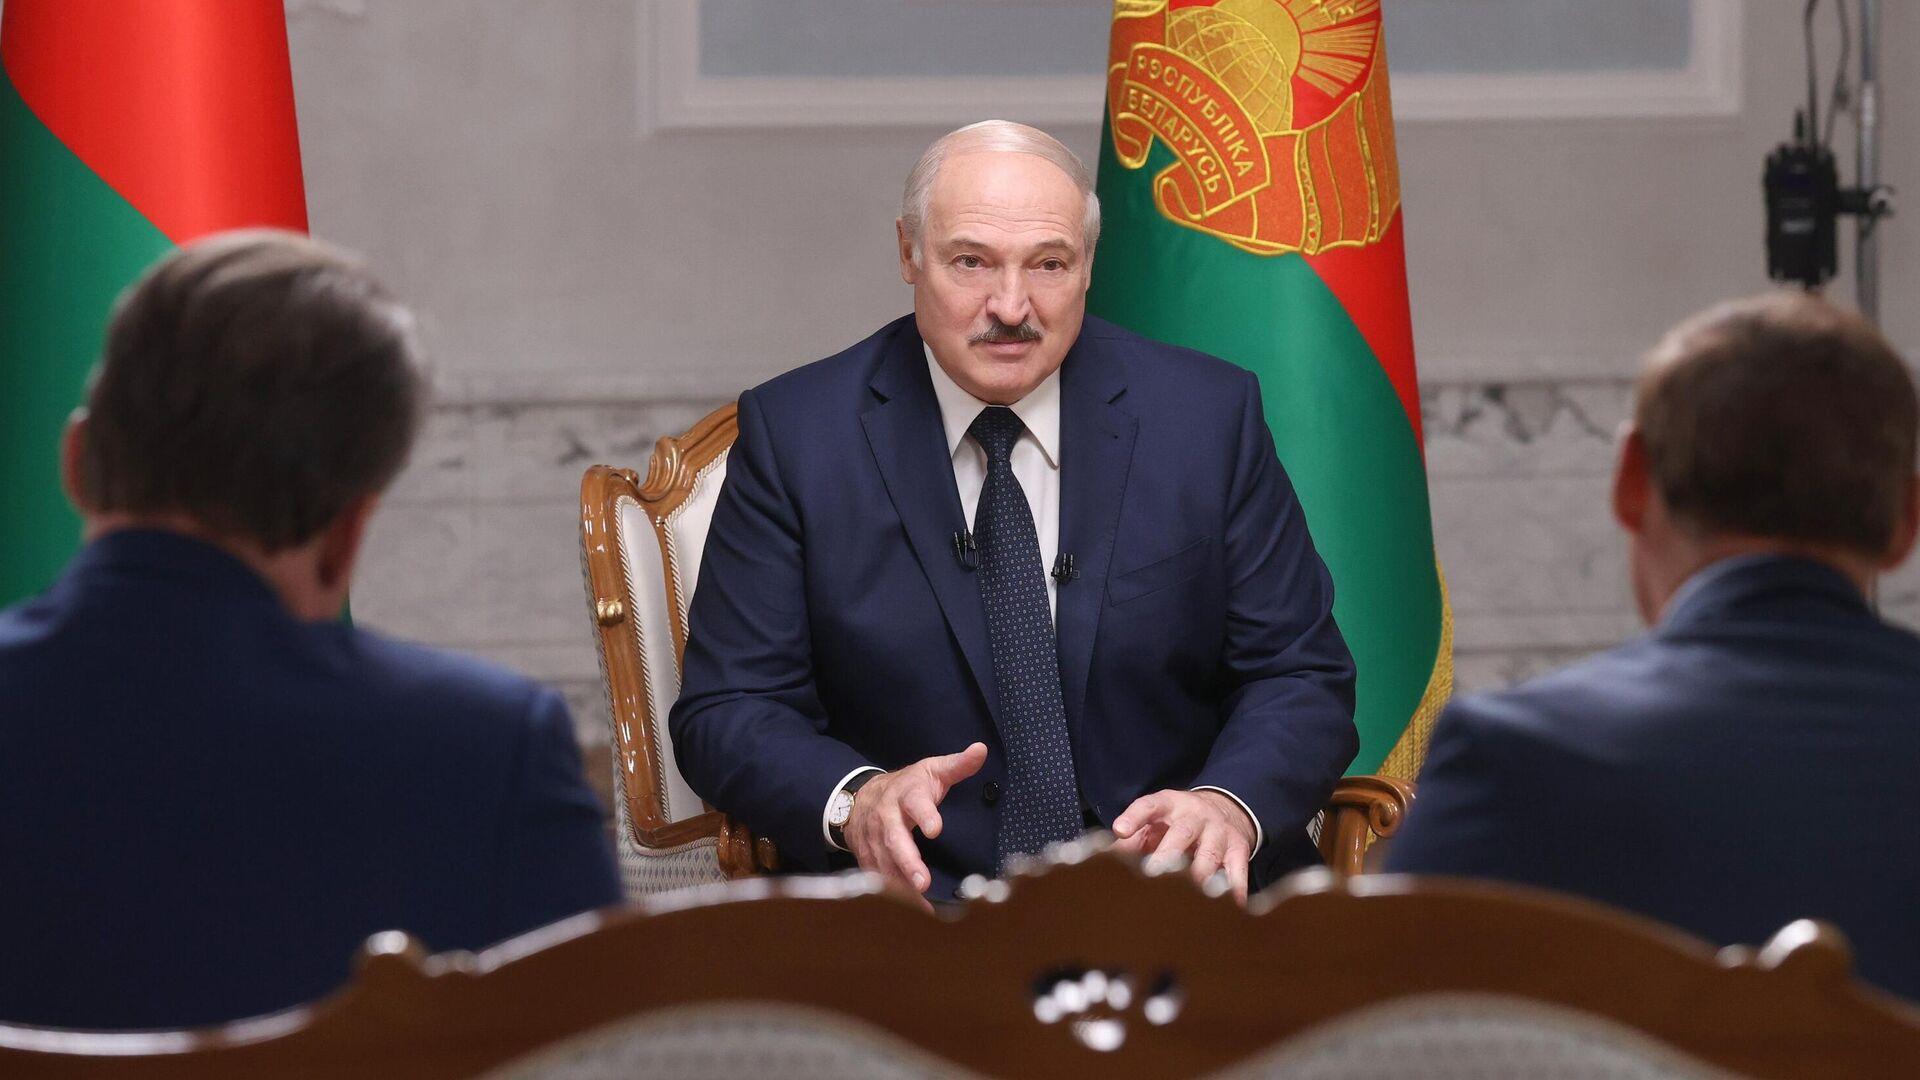 Президент Белоруссии Александр Лукашенко во время интервью российским журналистам во Дворце независимости в Минске - РИА Новости, 1920, 09.09.2020